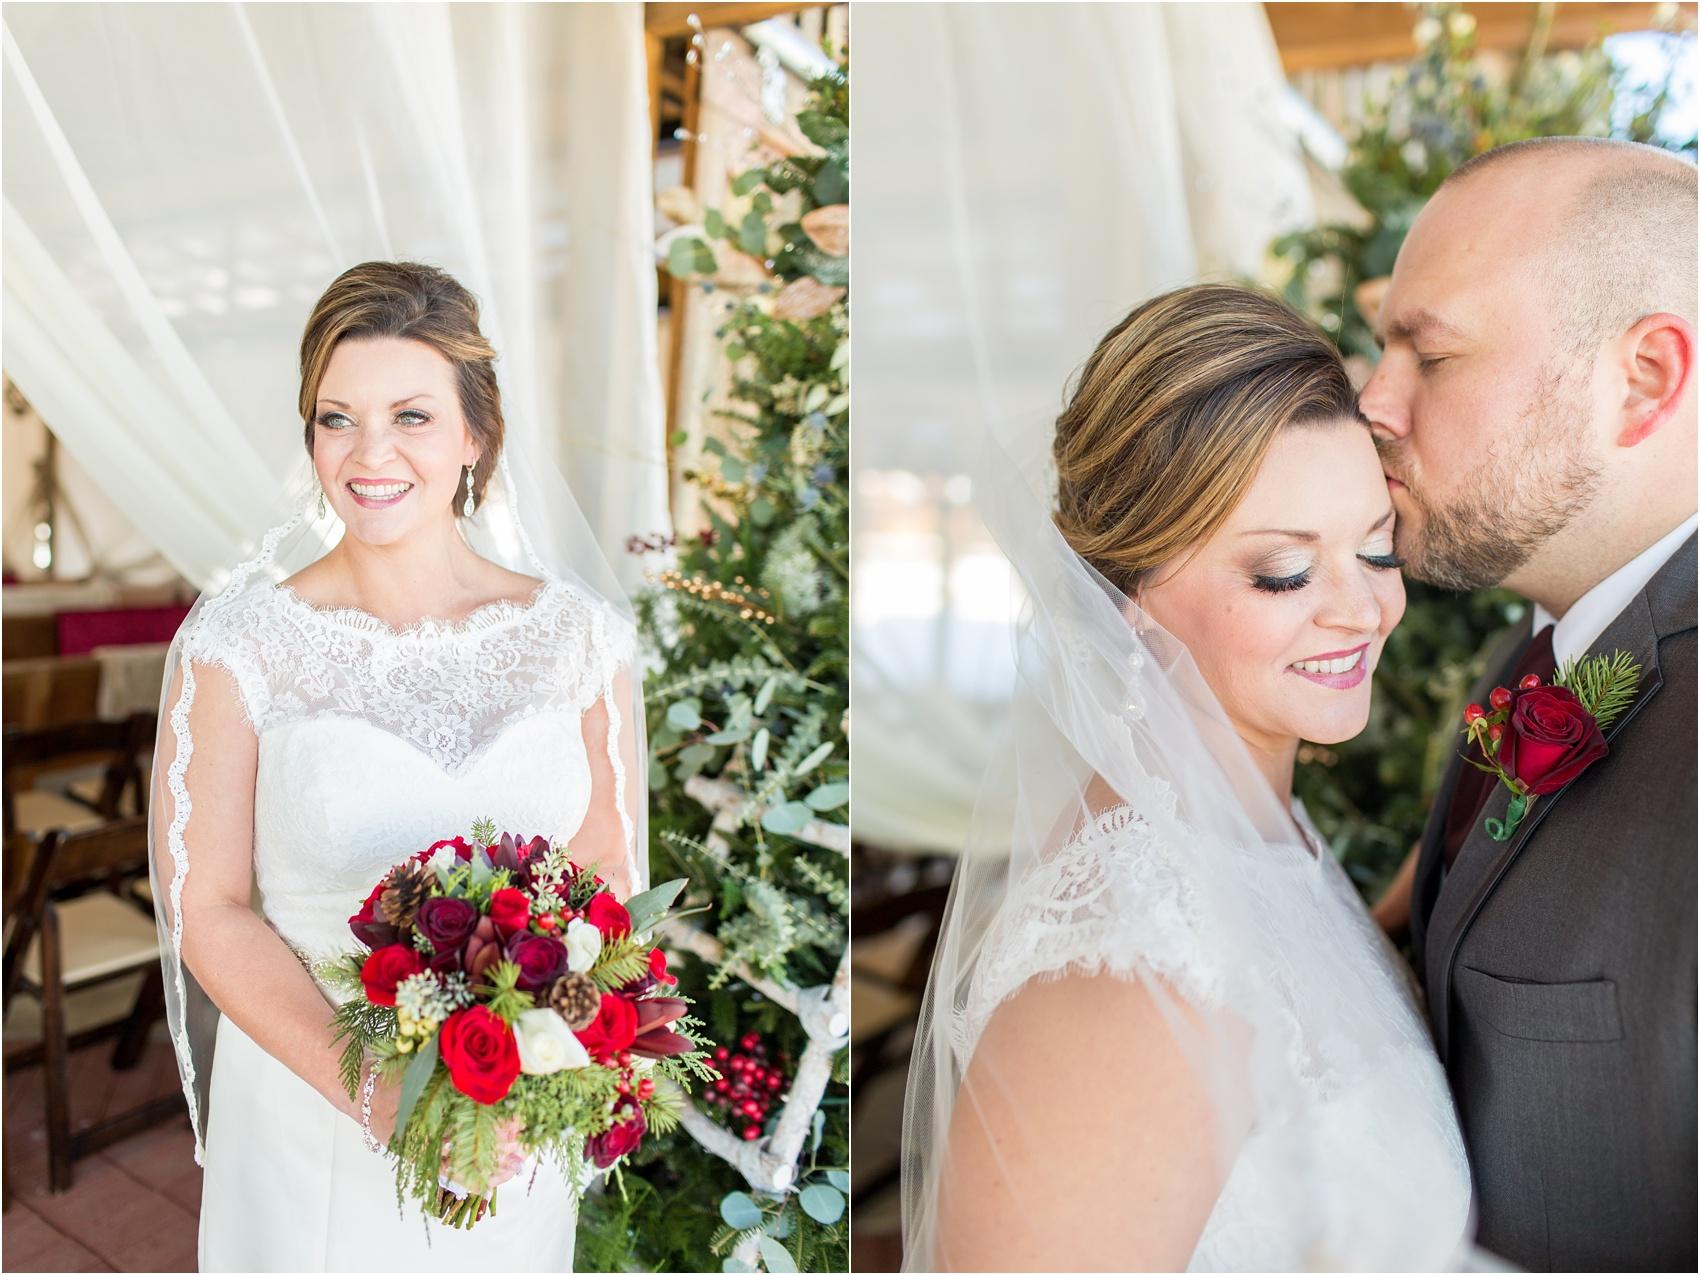 Savannah Eve Photography- Page Wedding Blog-37.jpg